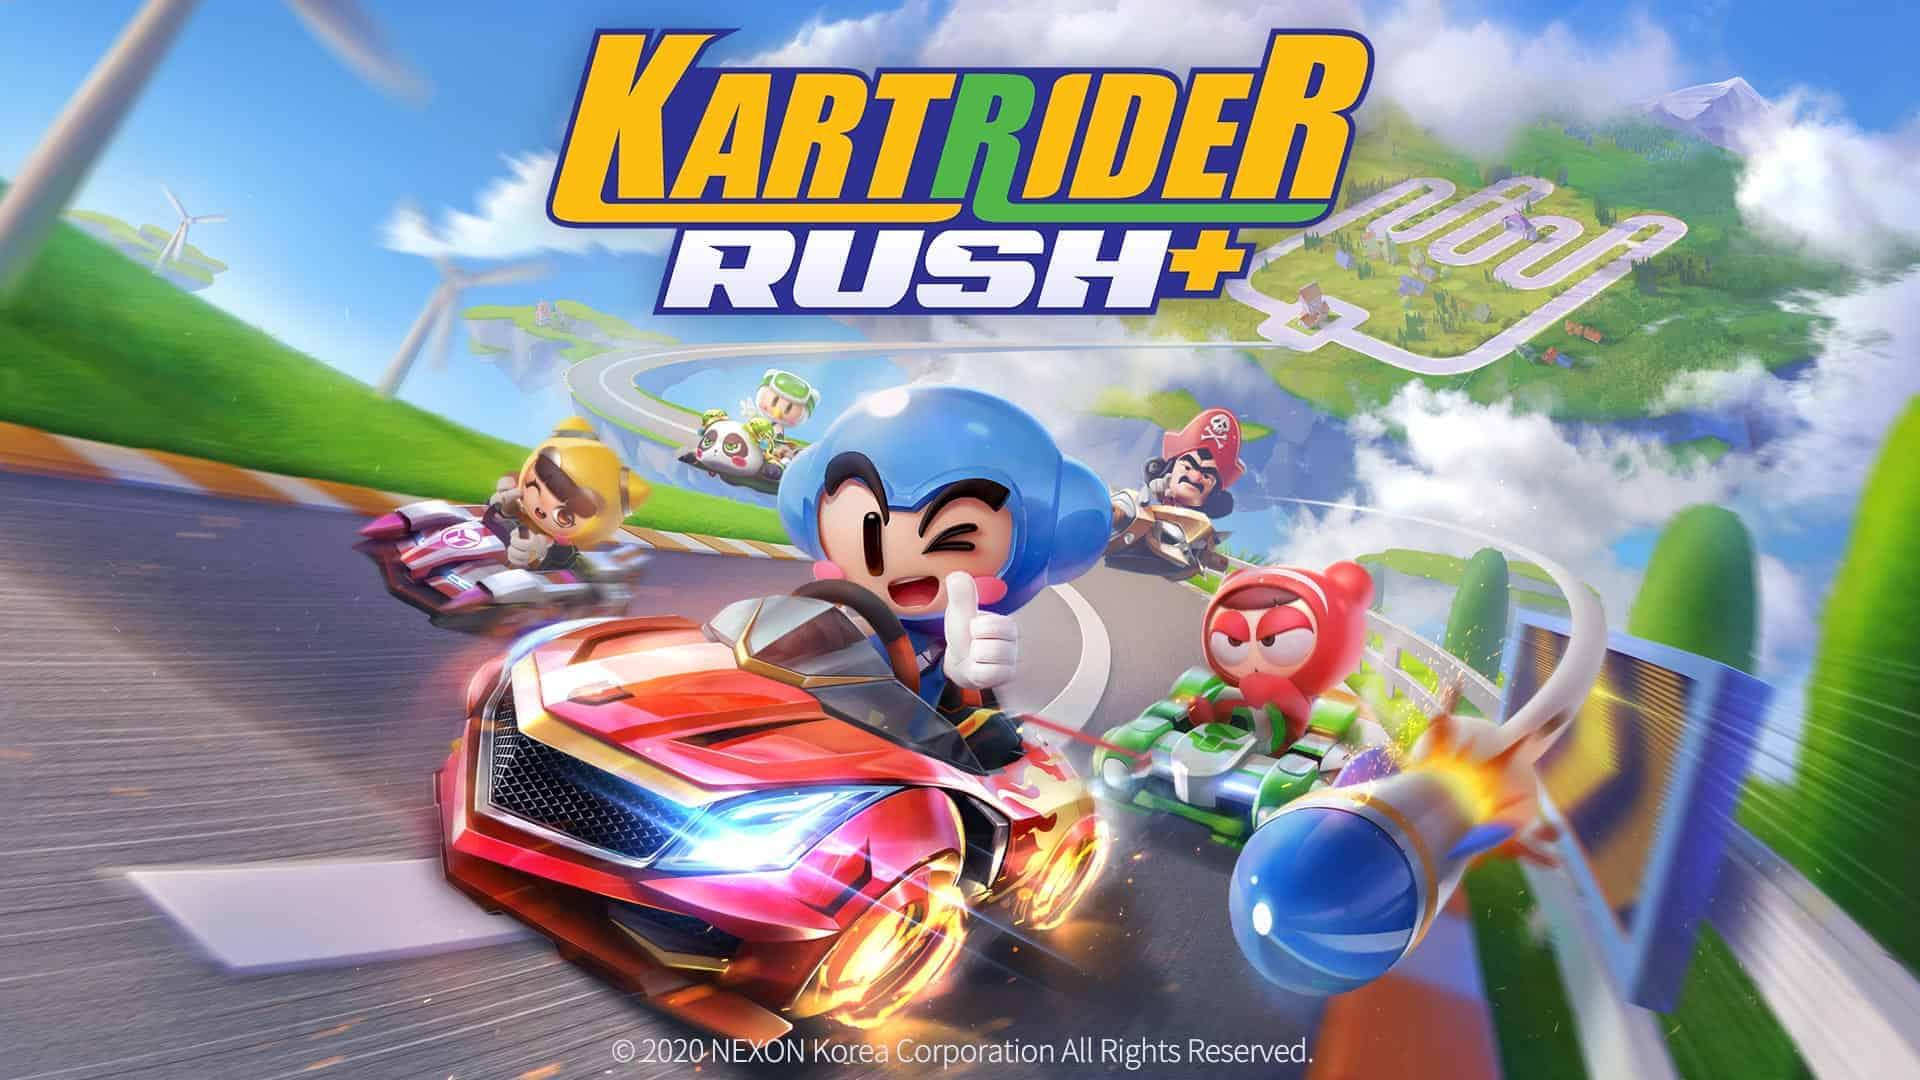 KartRider Rush+ Looks Like A Fun Alternative To Mario Kart Tour